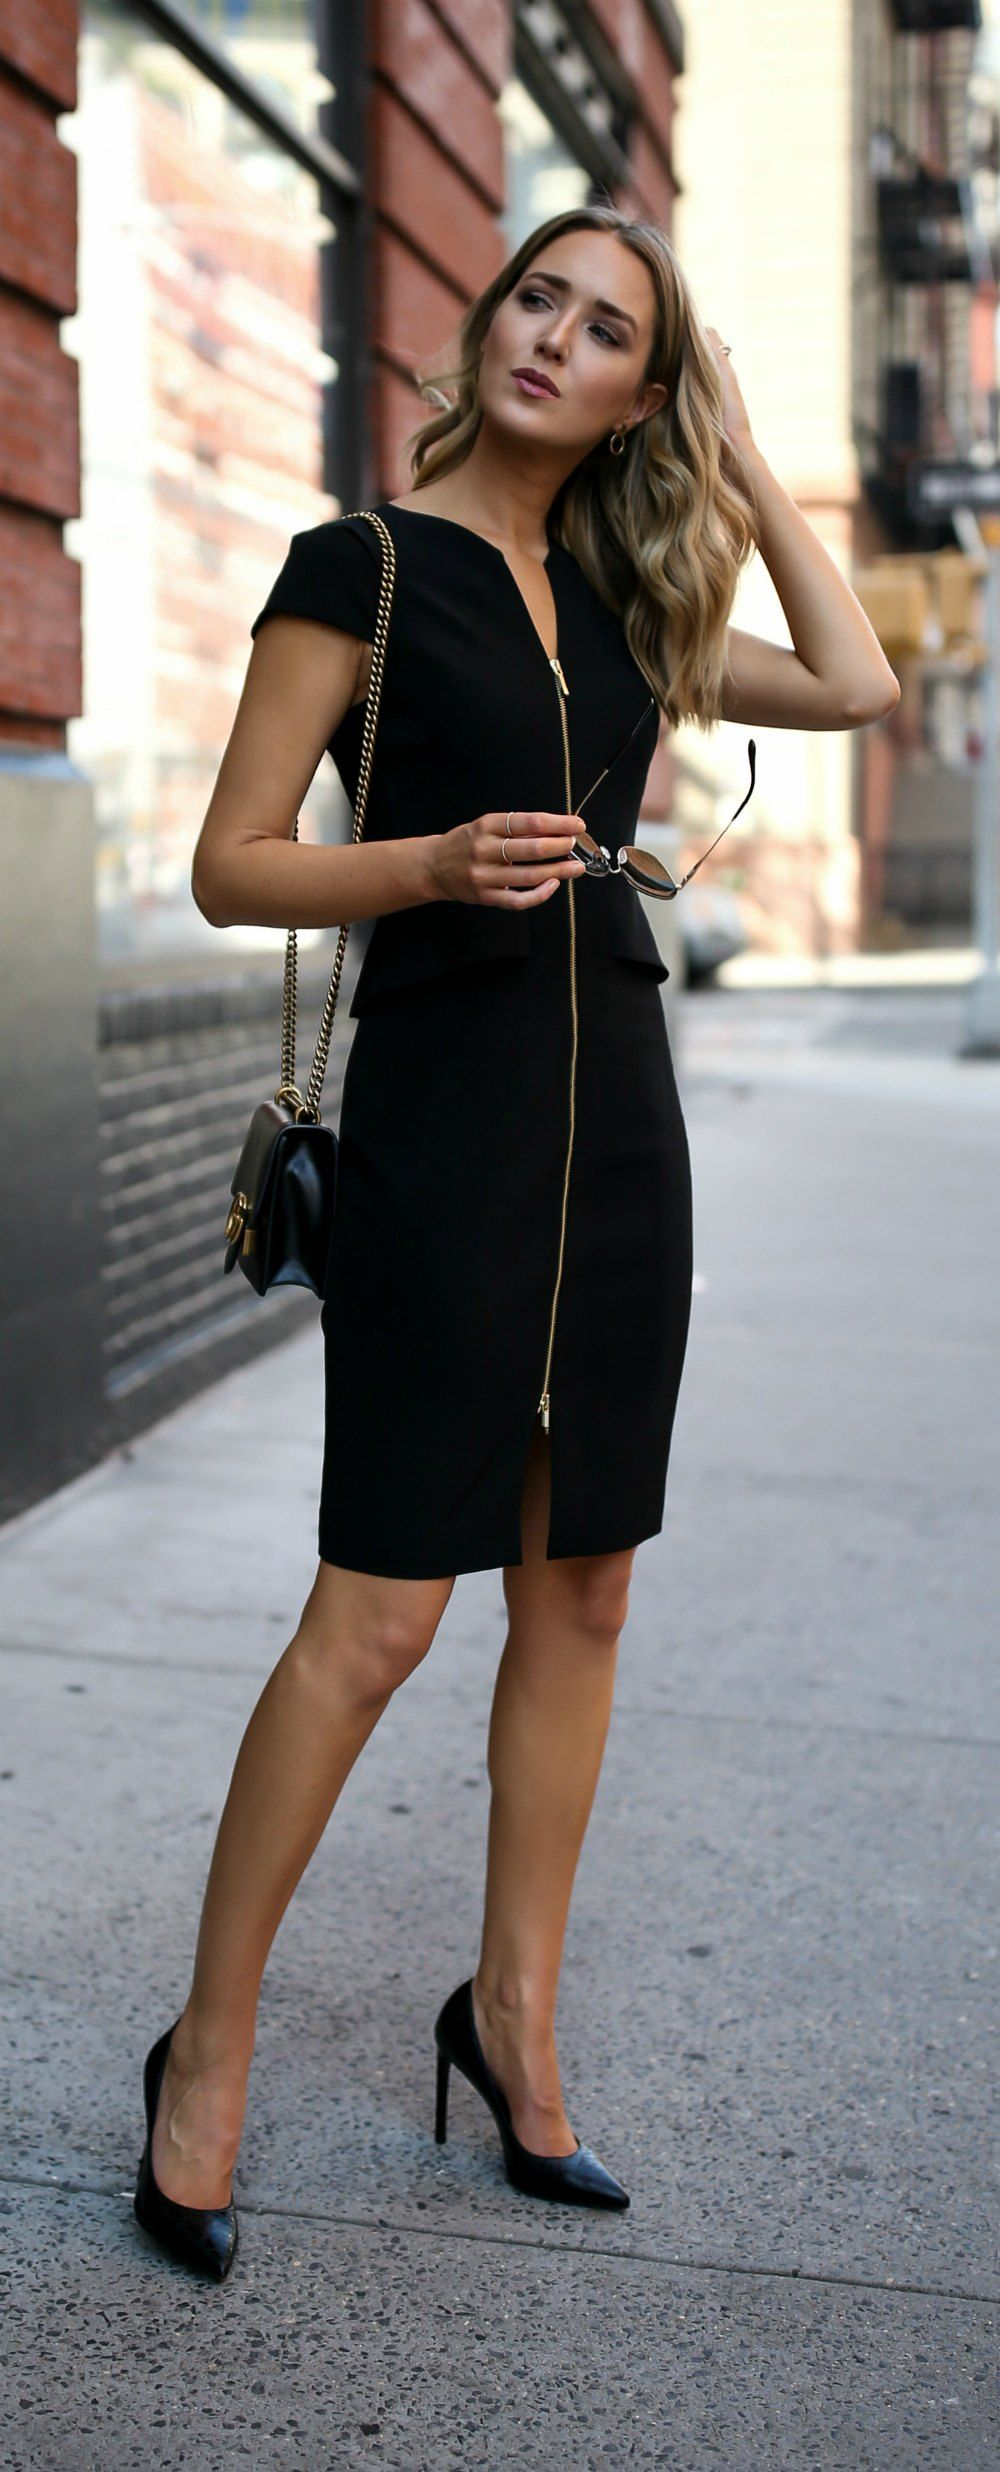 Classic Black Sheath Black Peplum Front Zip Sheath Dress Classic Black Pumps Oversized Sunglasses Ted Fashion Office Fashion Women Classic Style Outfits [ 2472 x 1000 Pixel ]